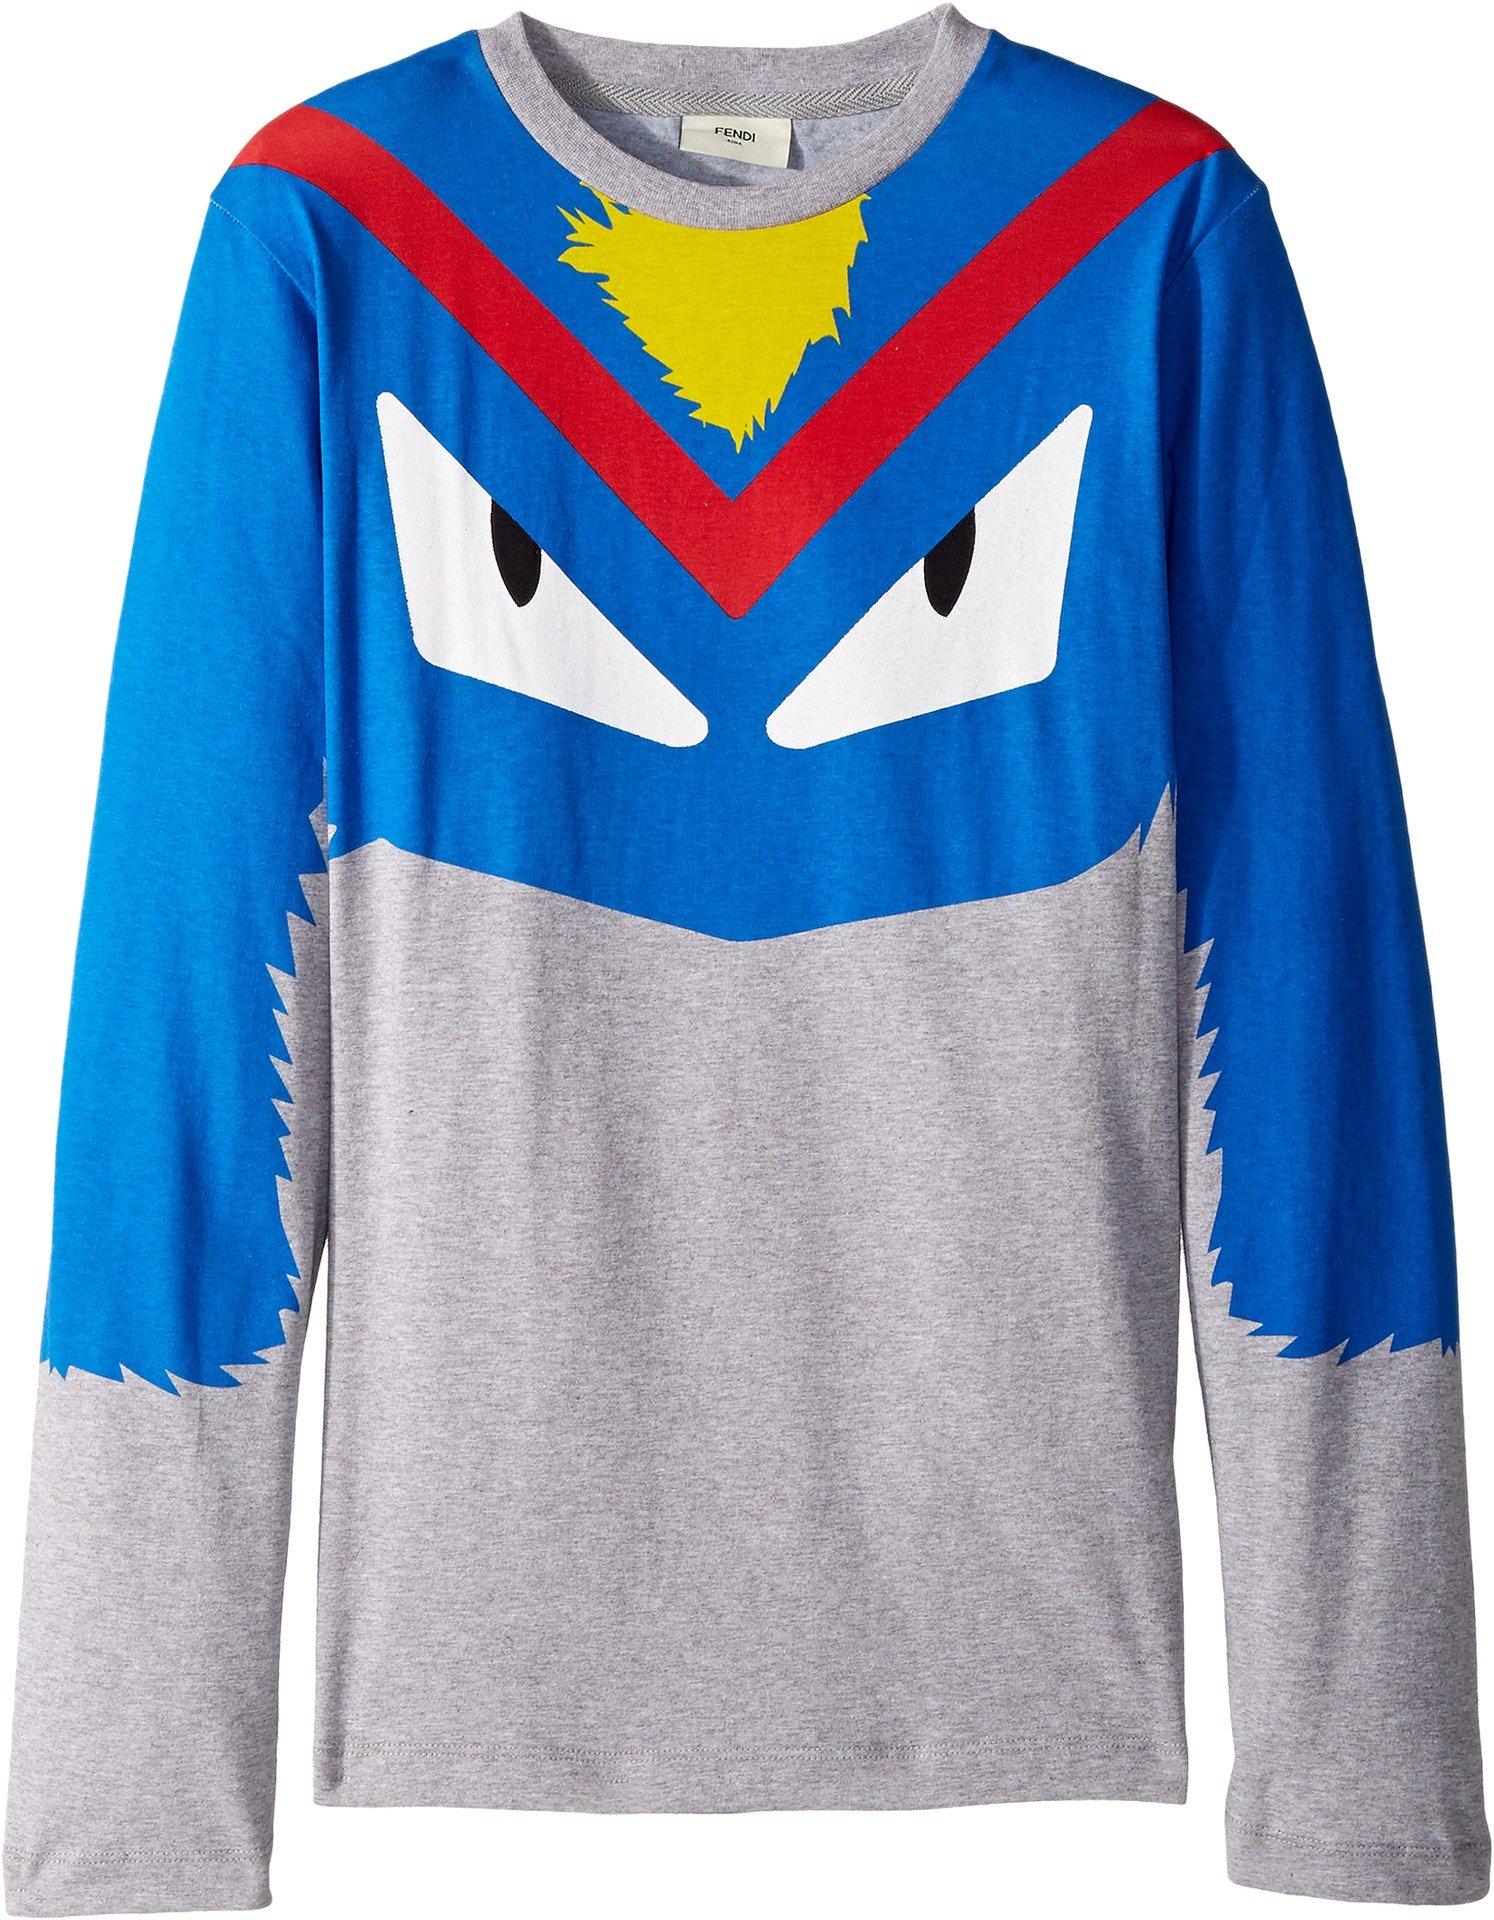 Fendi Kids  Boy's Long Sleeve Monster Eyes Graphic T-Shirt (Big Kids) Grey/Multi 12  Years by Fendi Kids